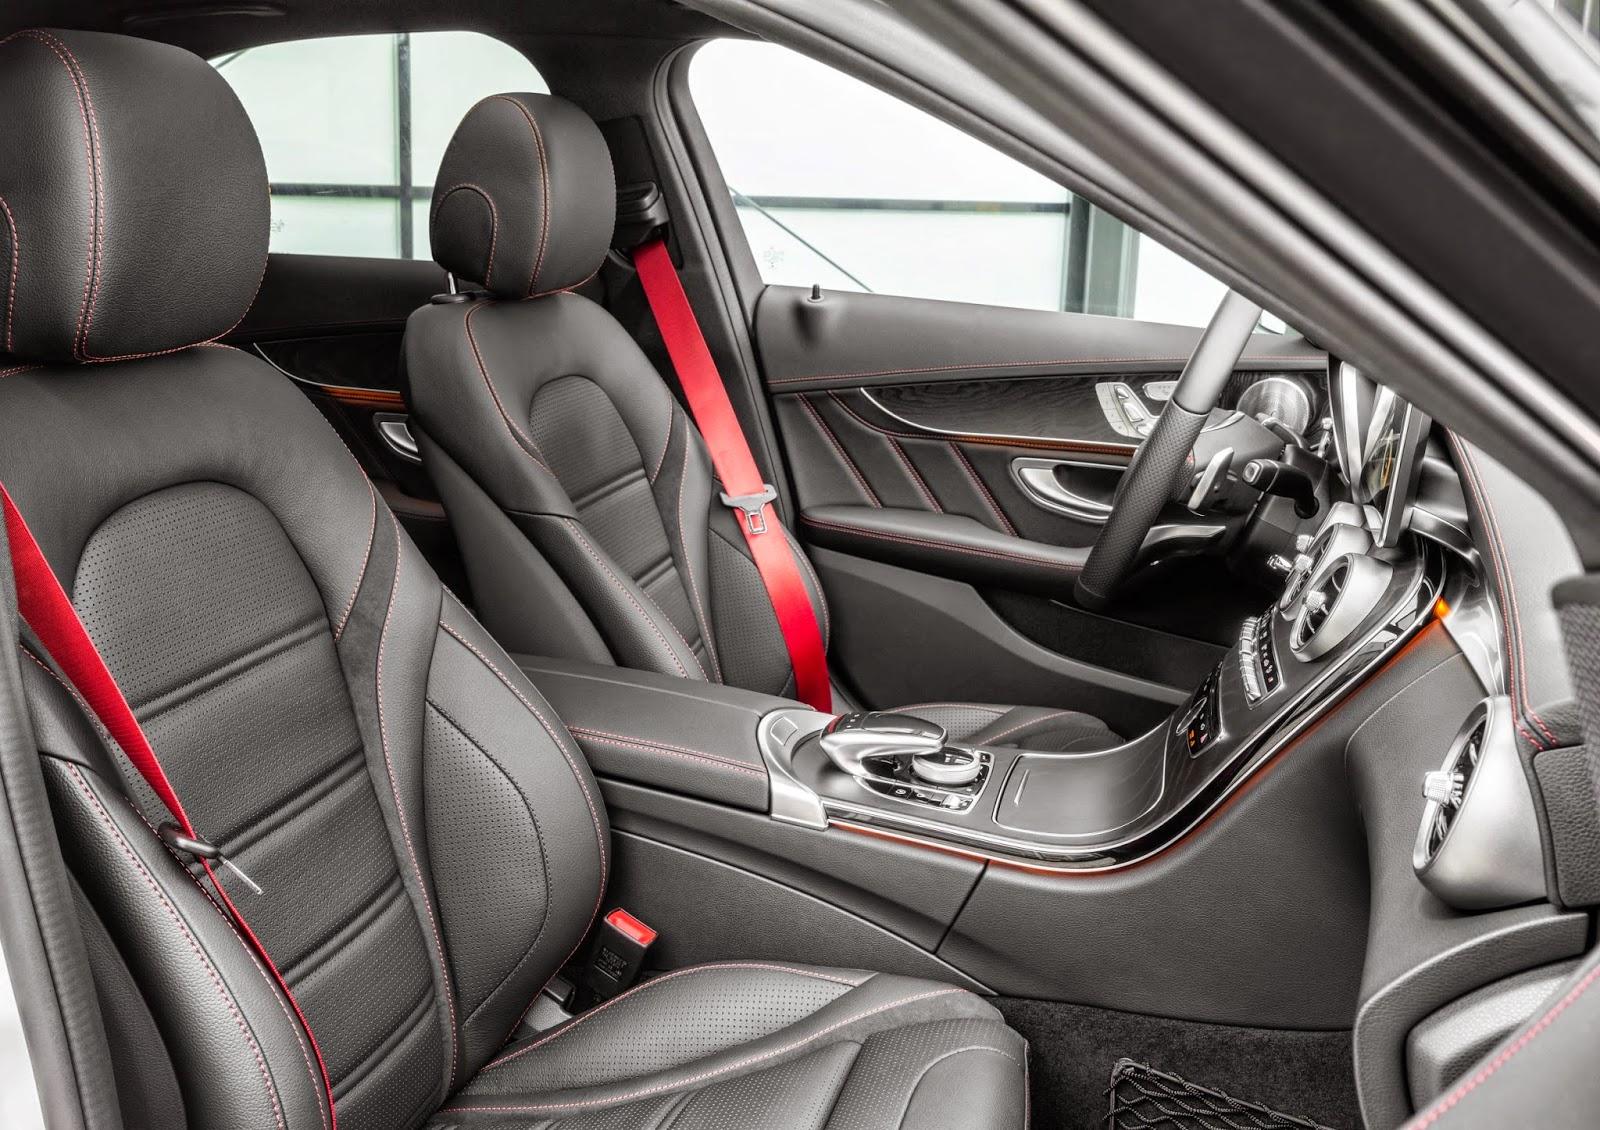 Mercedes Benz C450 AMG interior